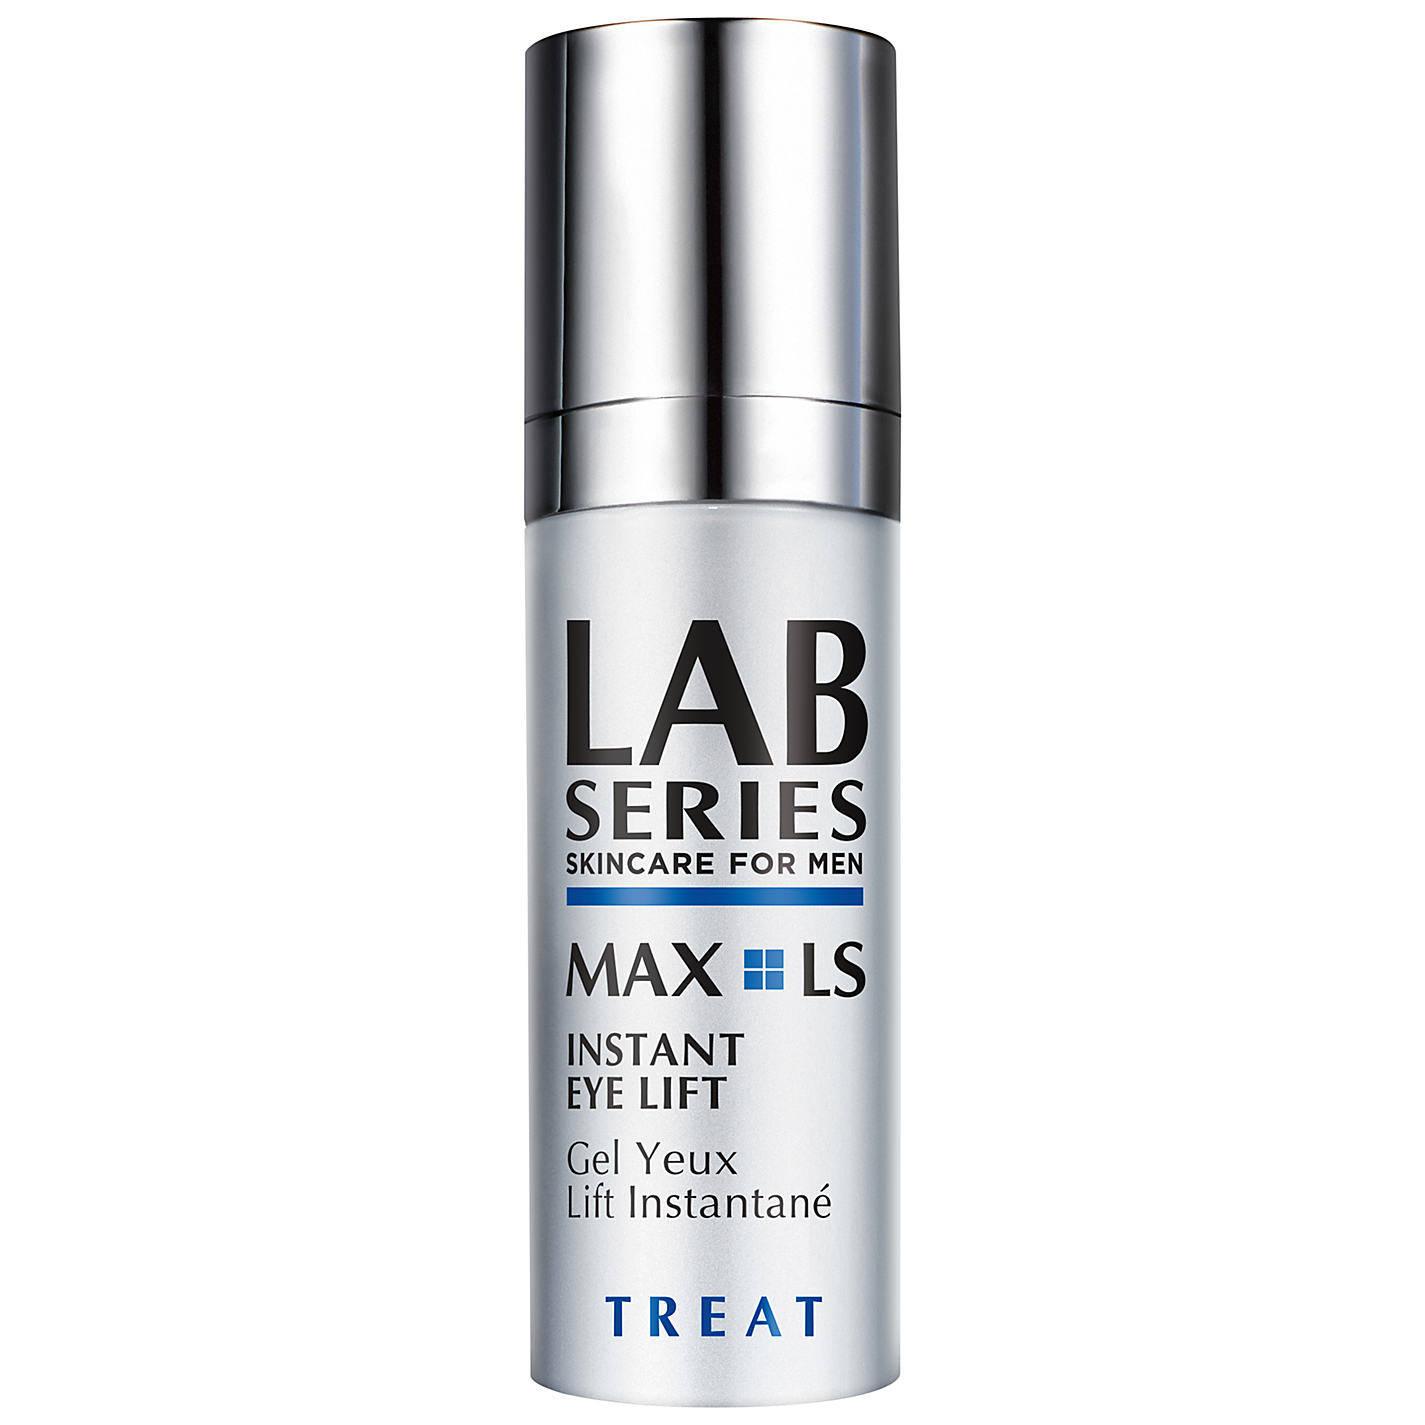 lab series max ls instant eye lift review men grooming inhautepursuit